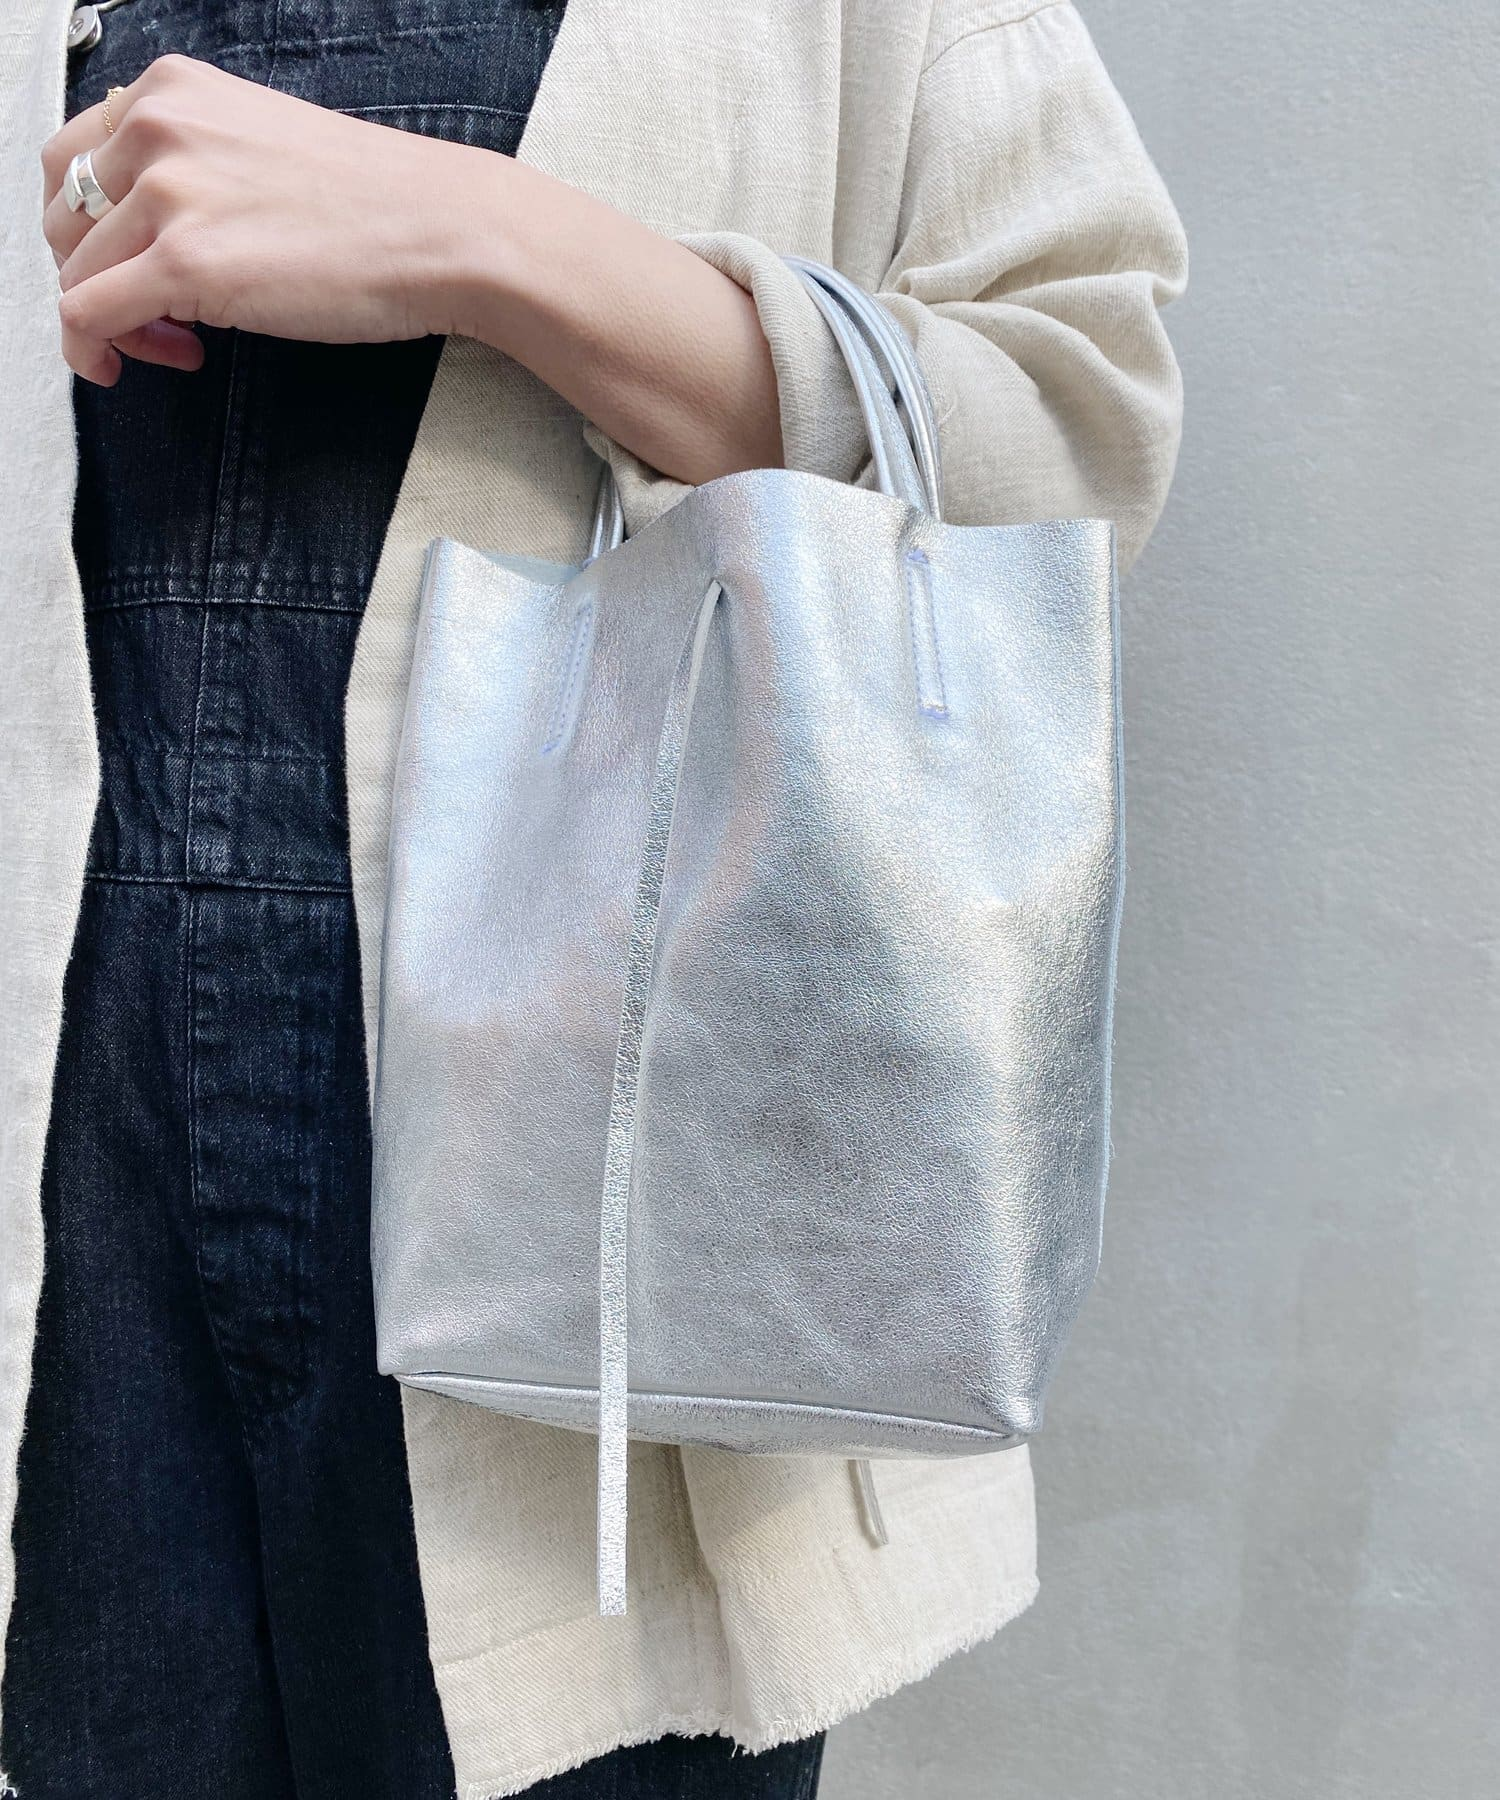 SHENERY(シーナリー) 【WEB限定】(AULENTTI/オーレンティ) レザーバッグ